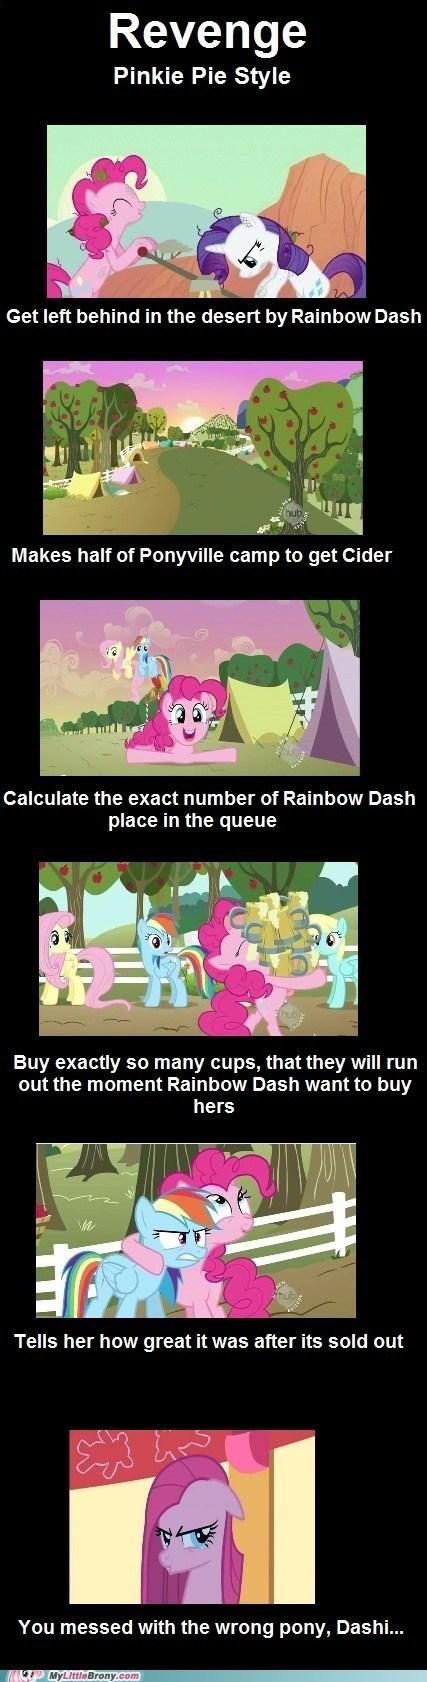 apple cider comics pinkie pie rainbow dash revenge - 5777921536